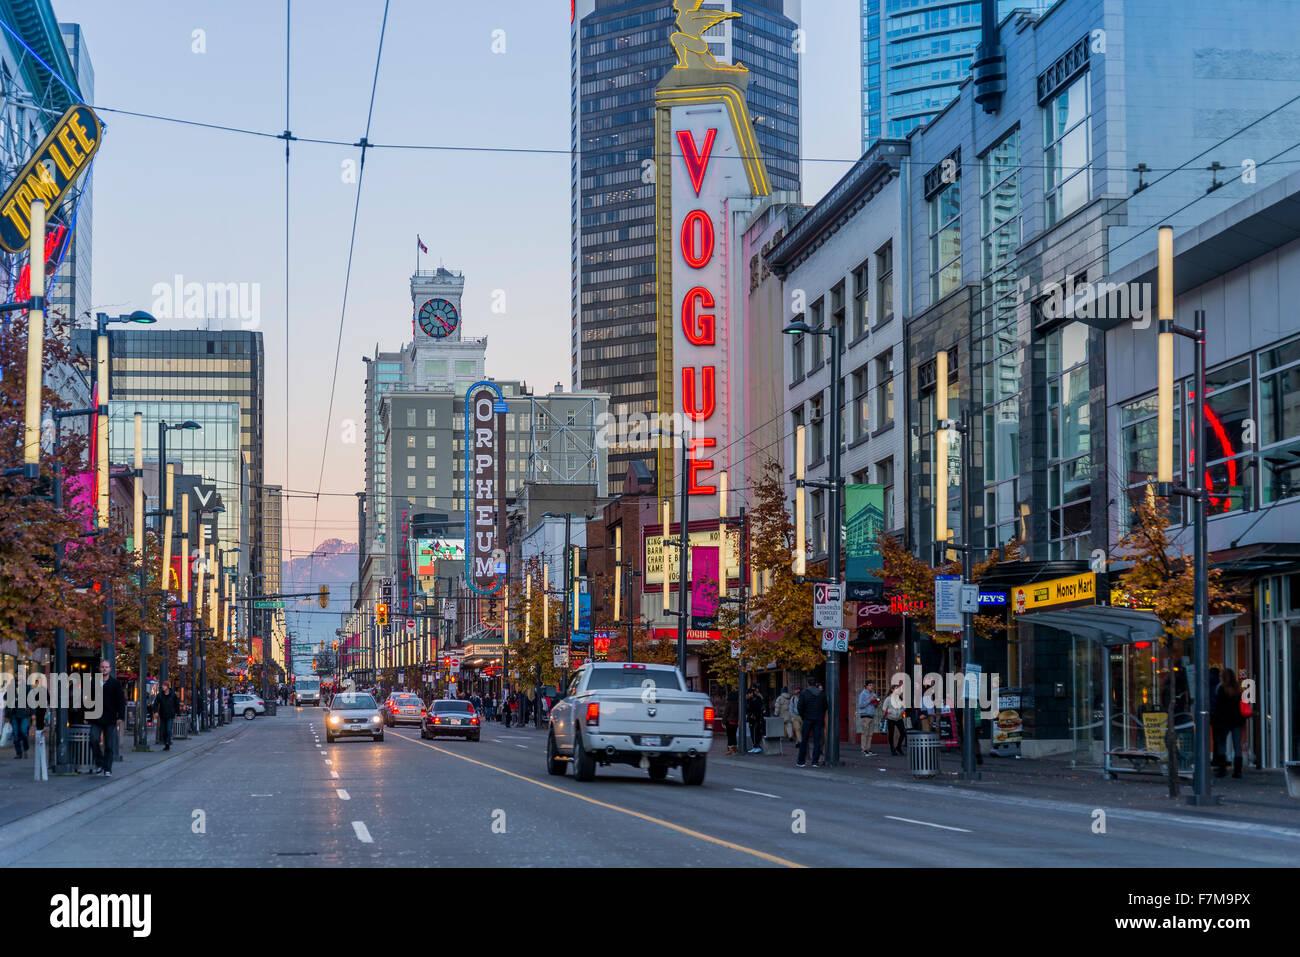 Vogue Theatre, Granville Street, Vancouver, British Columbia, Canada, Photo Stock